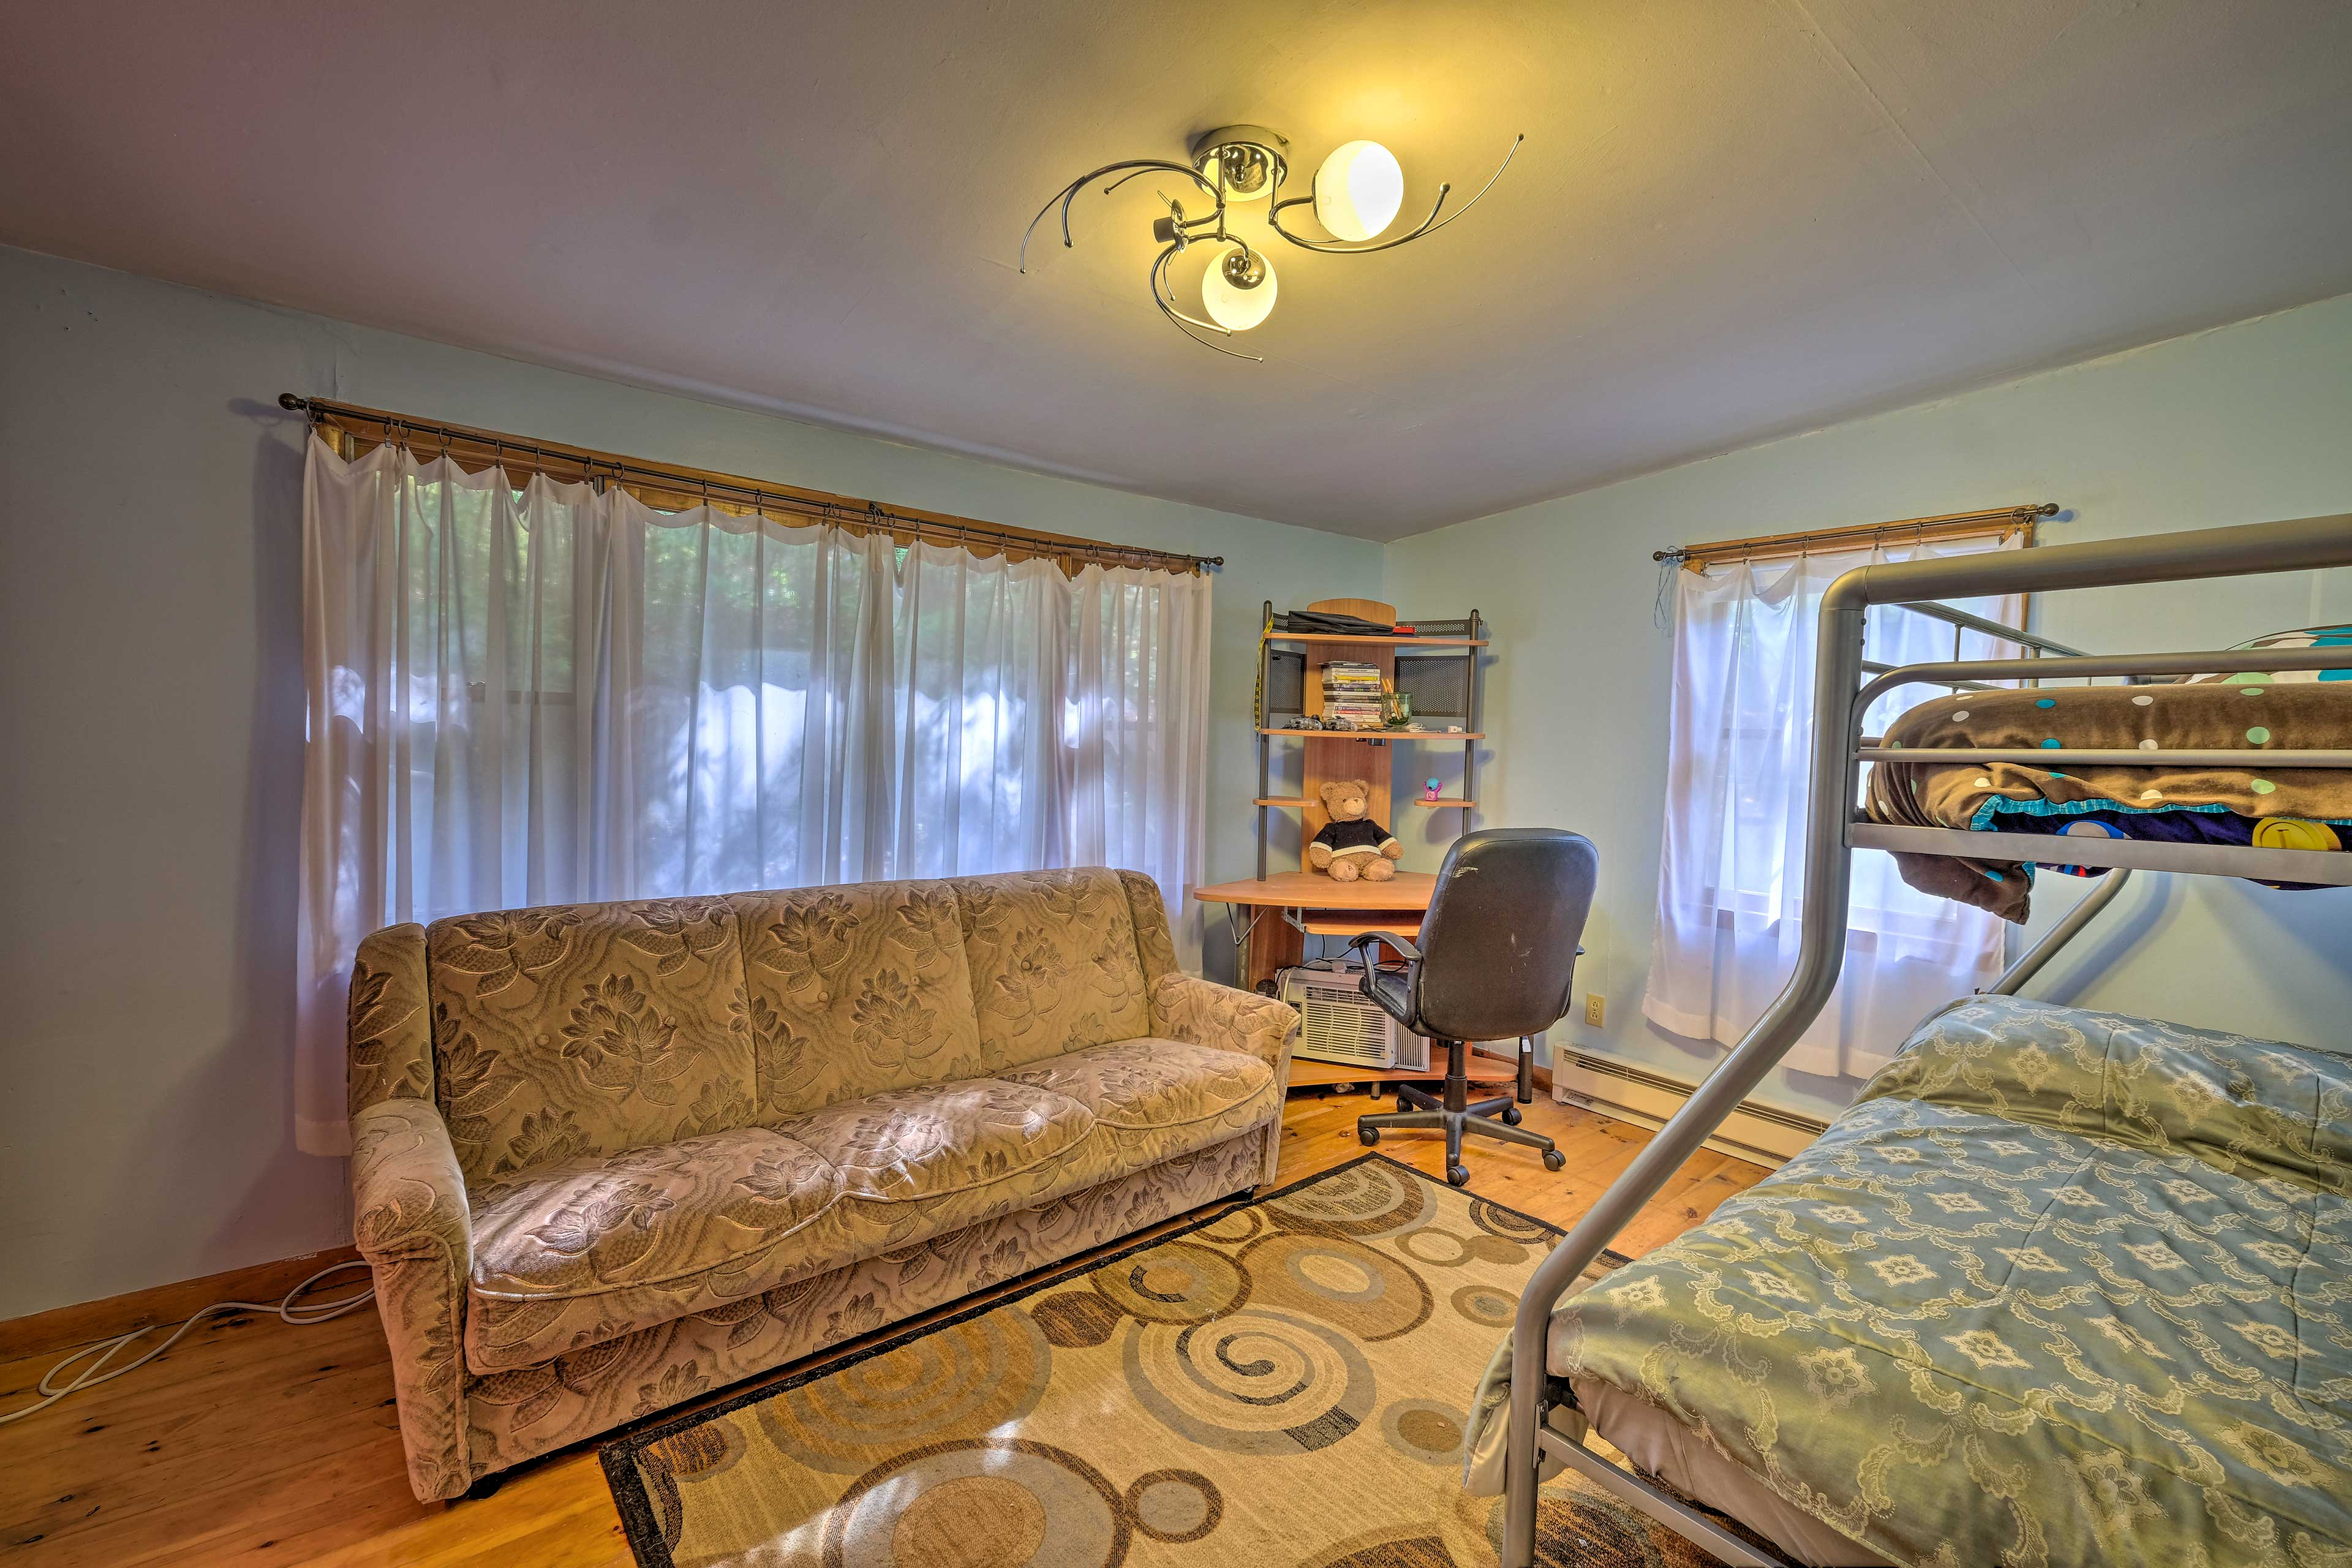 This bedroom sleeps 5.